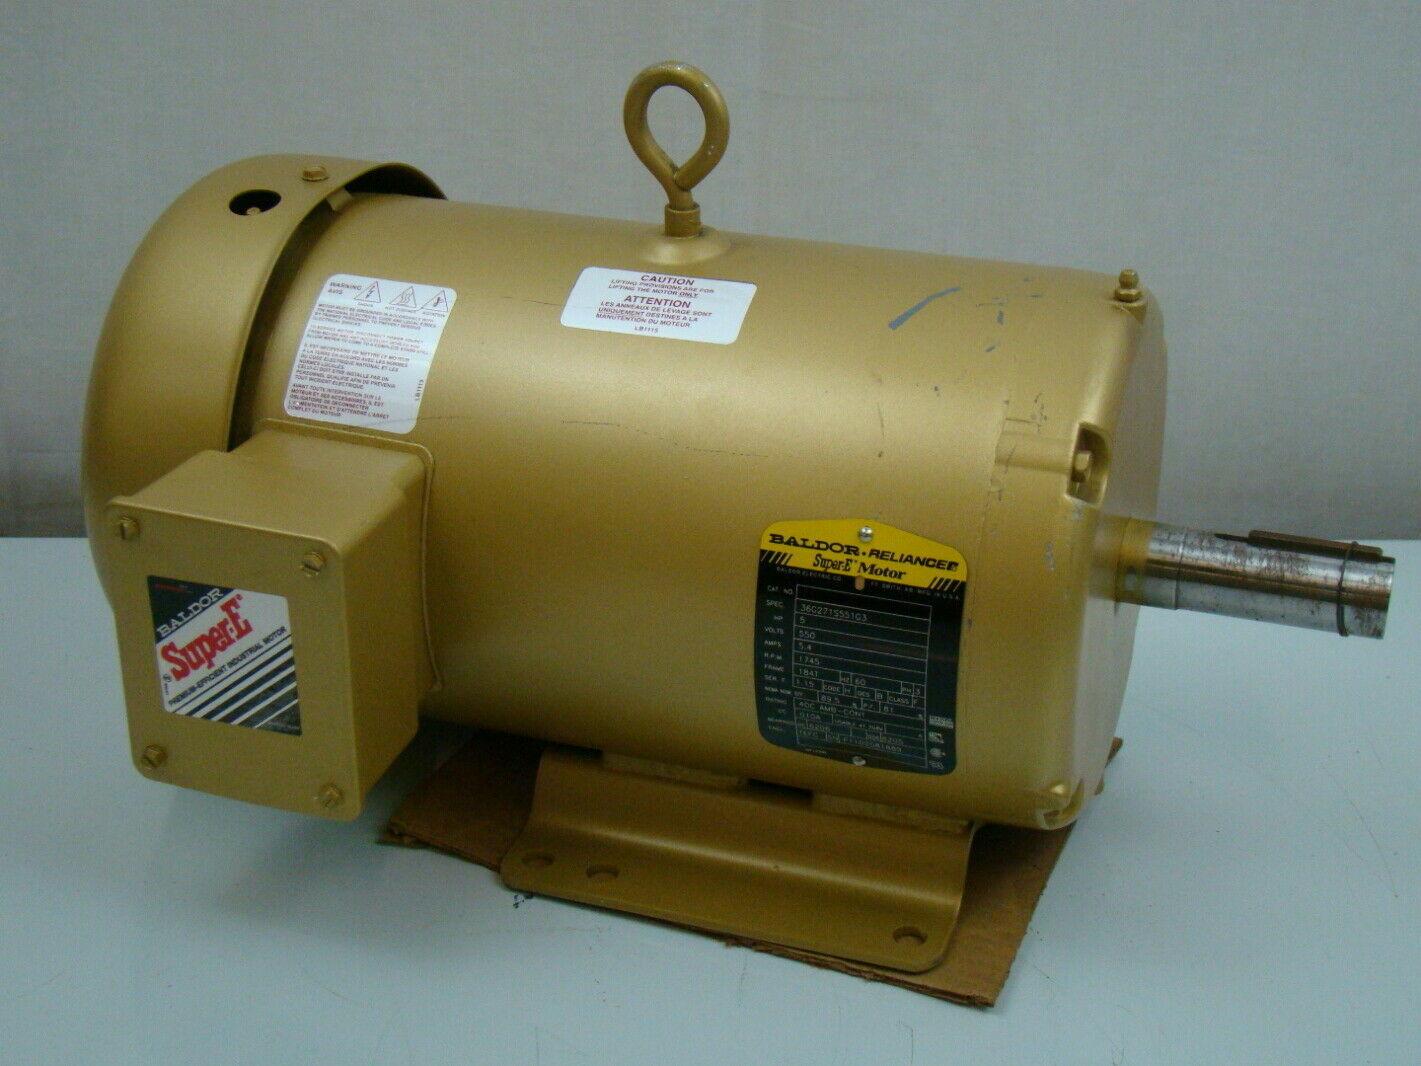 Baldor 5 Hp 550v Electric Motor 36g271s551g3 Ebay